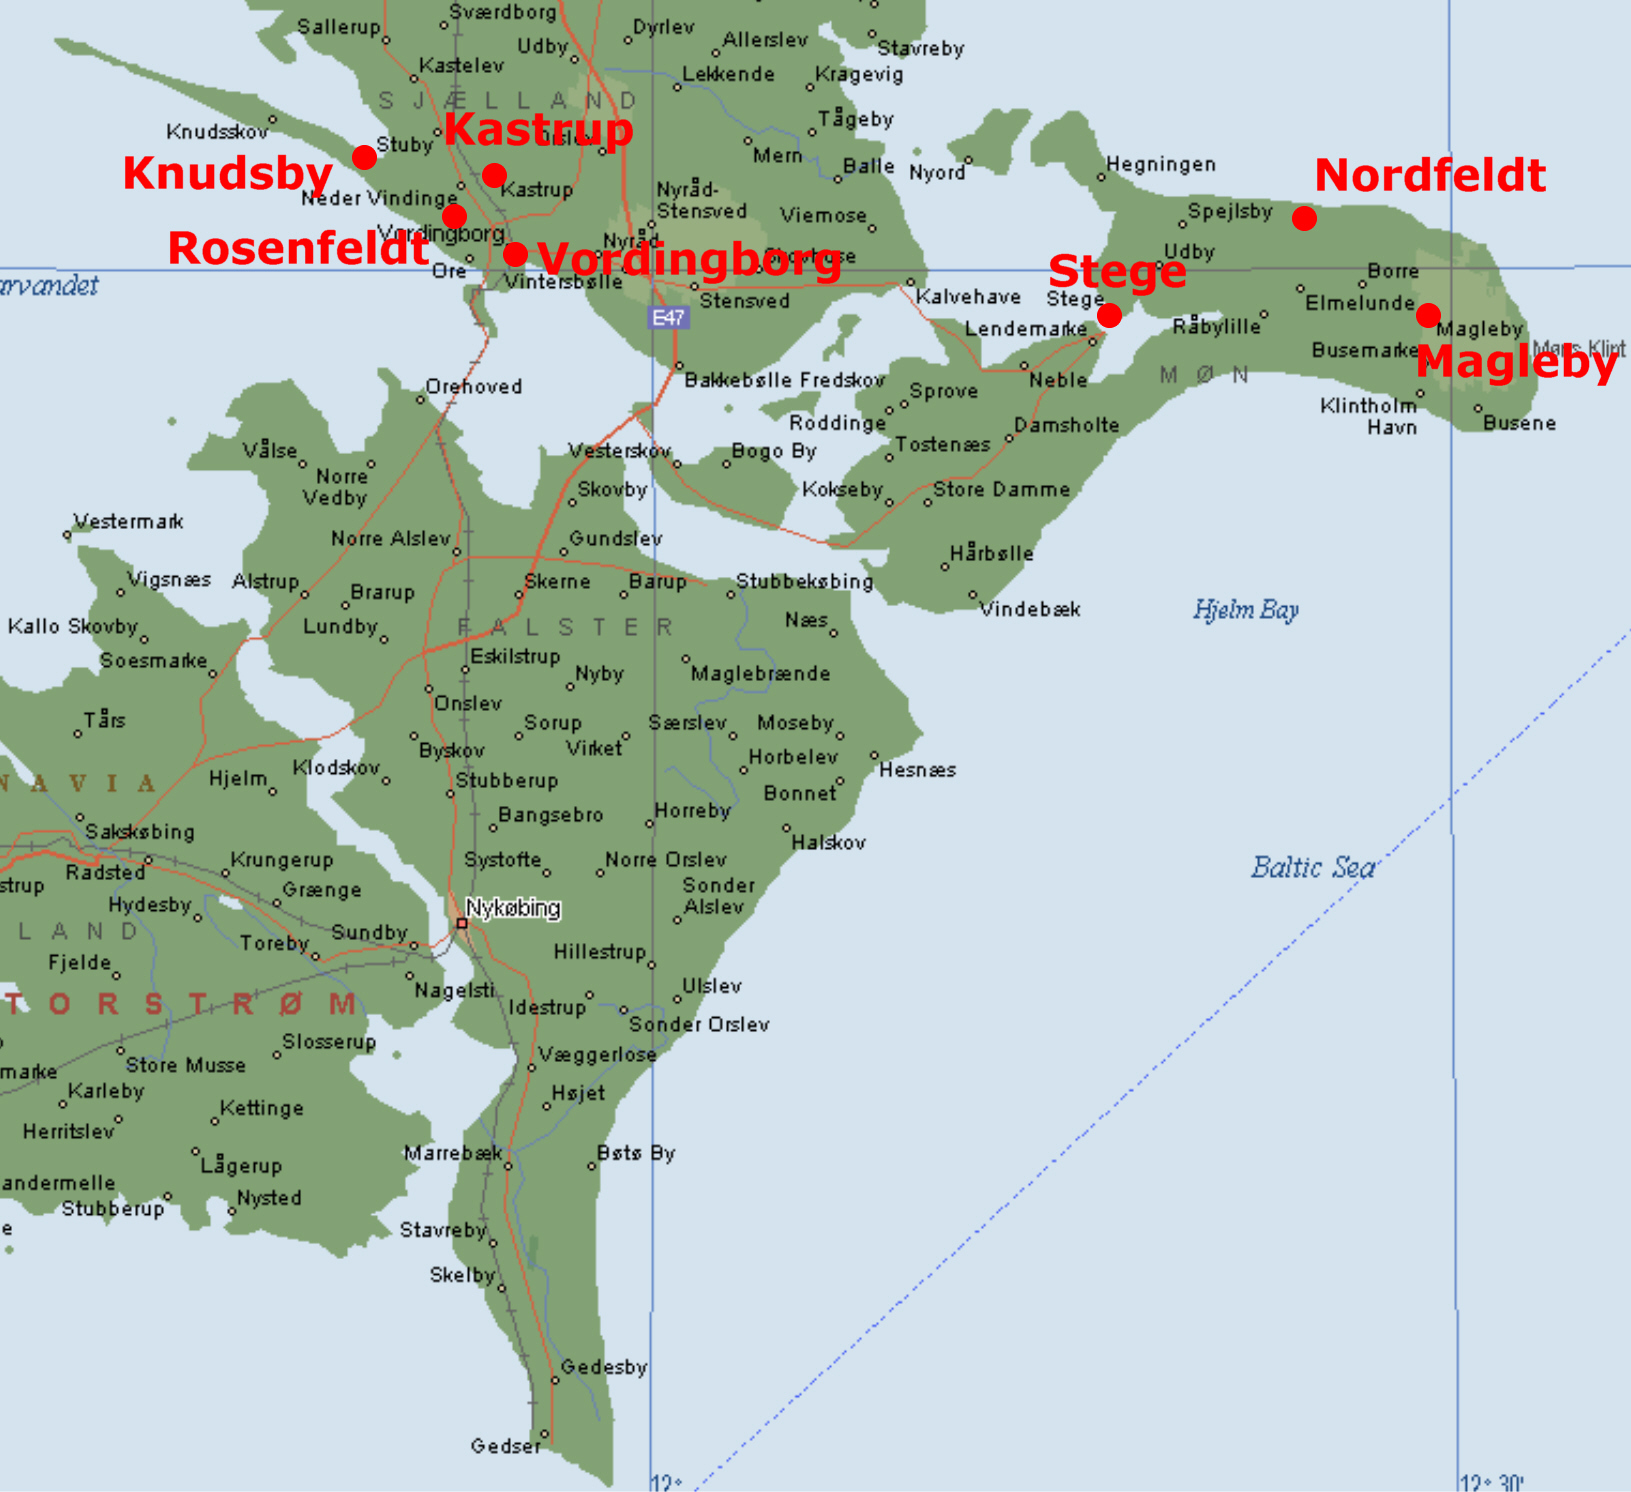 Kort Over Sydsjaelland